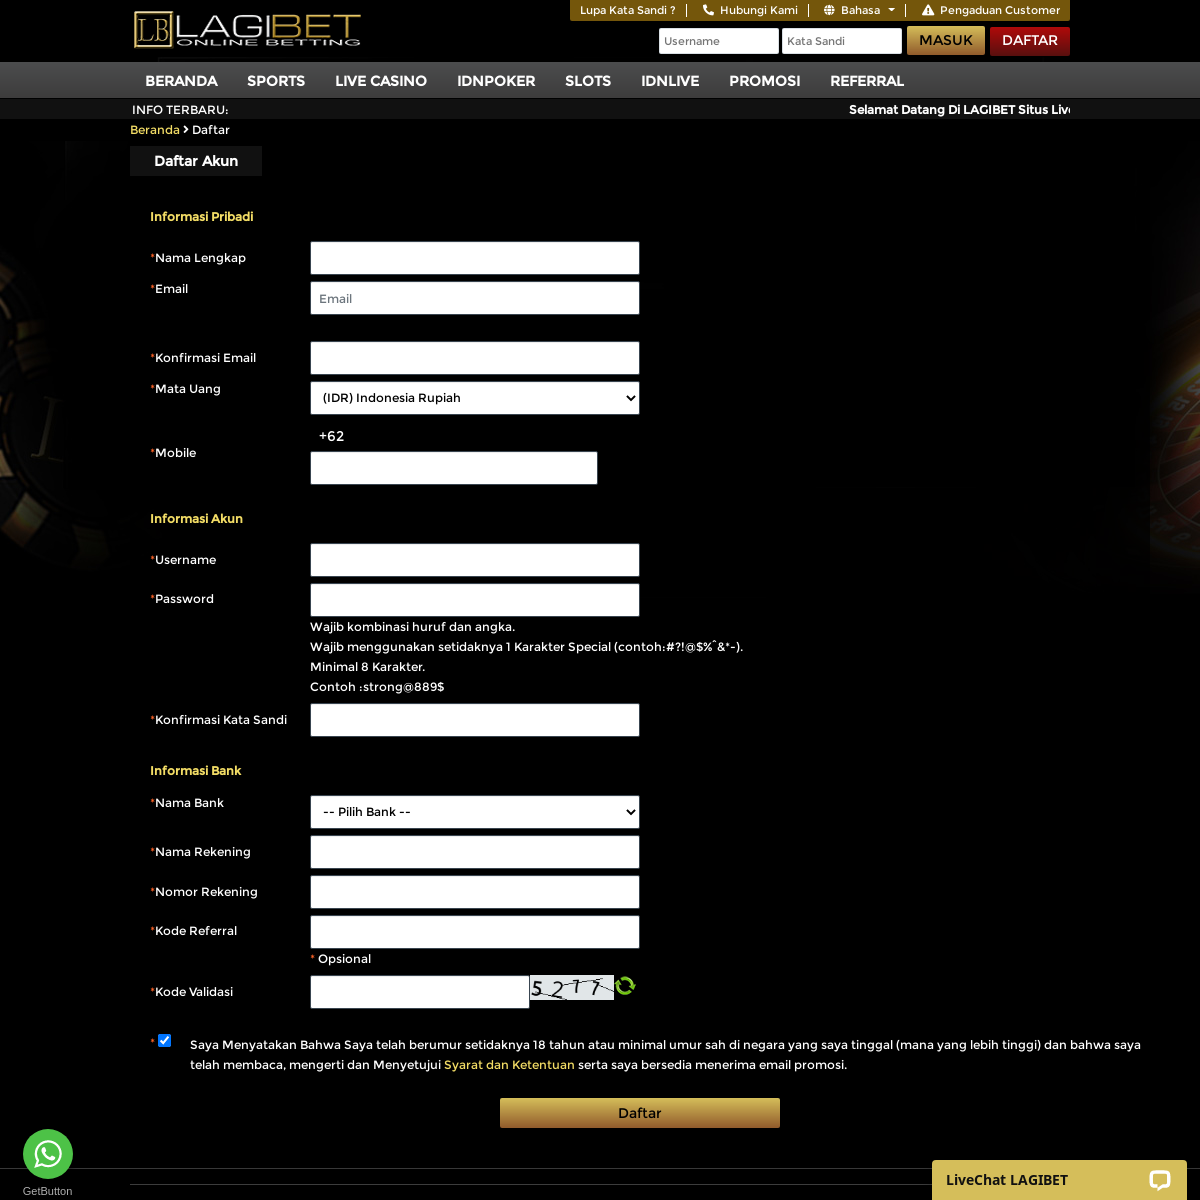 Daftar Casino Online Daftar Judi Online Daftar Live Casino Indonesia Lagibet